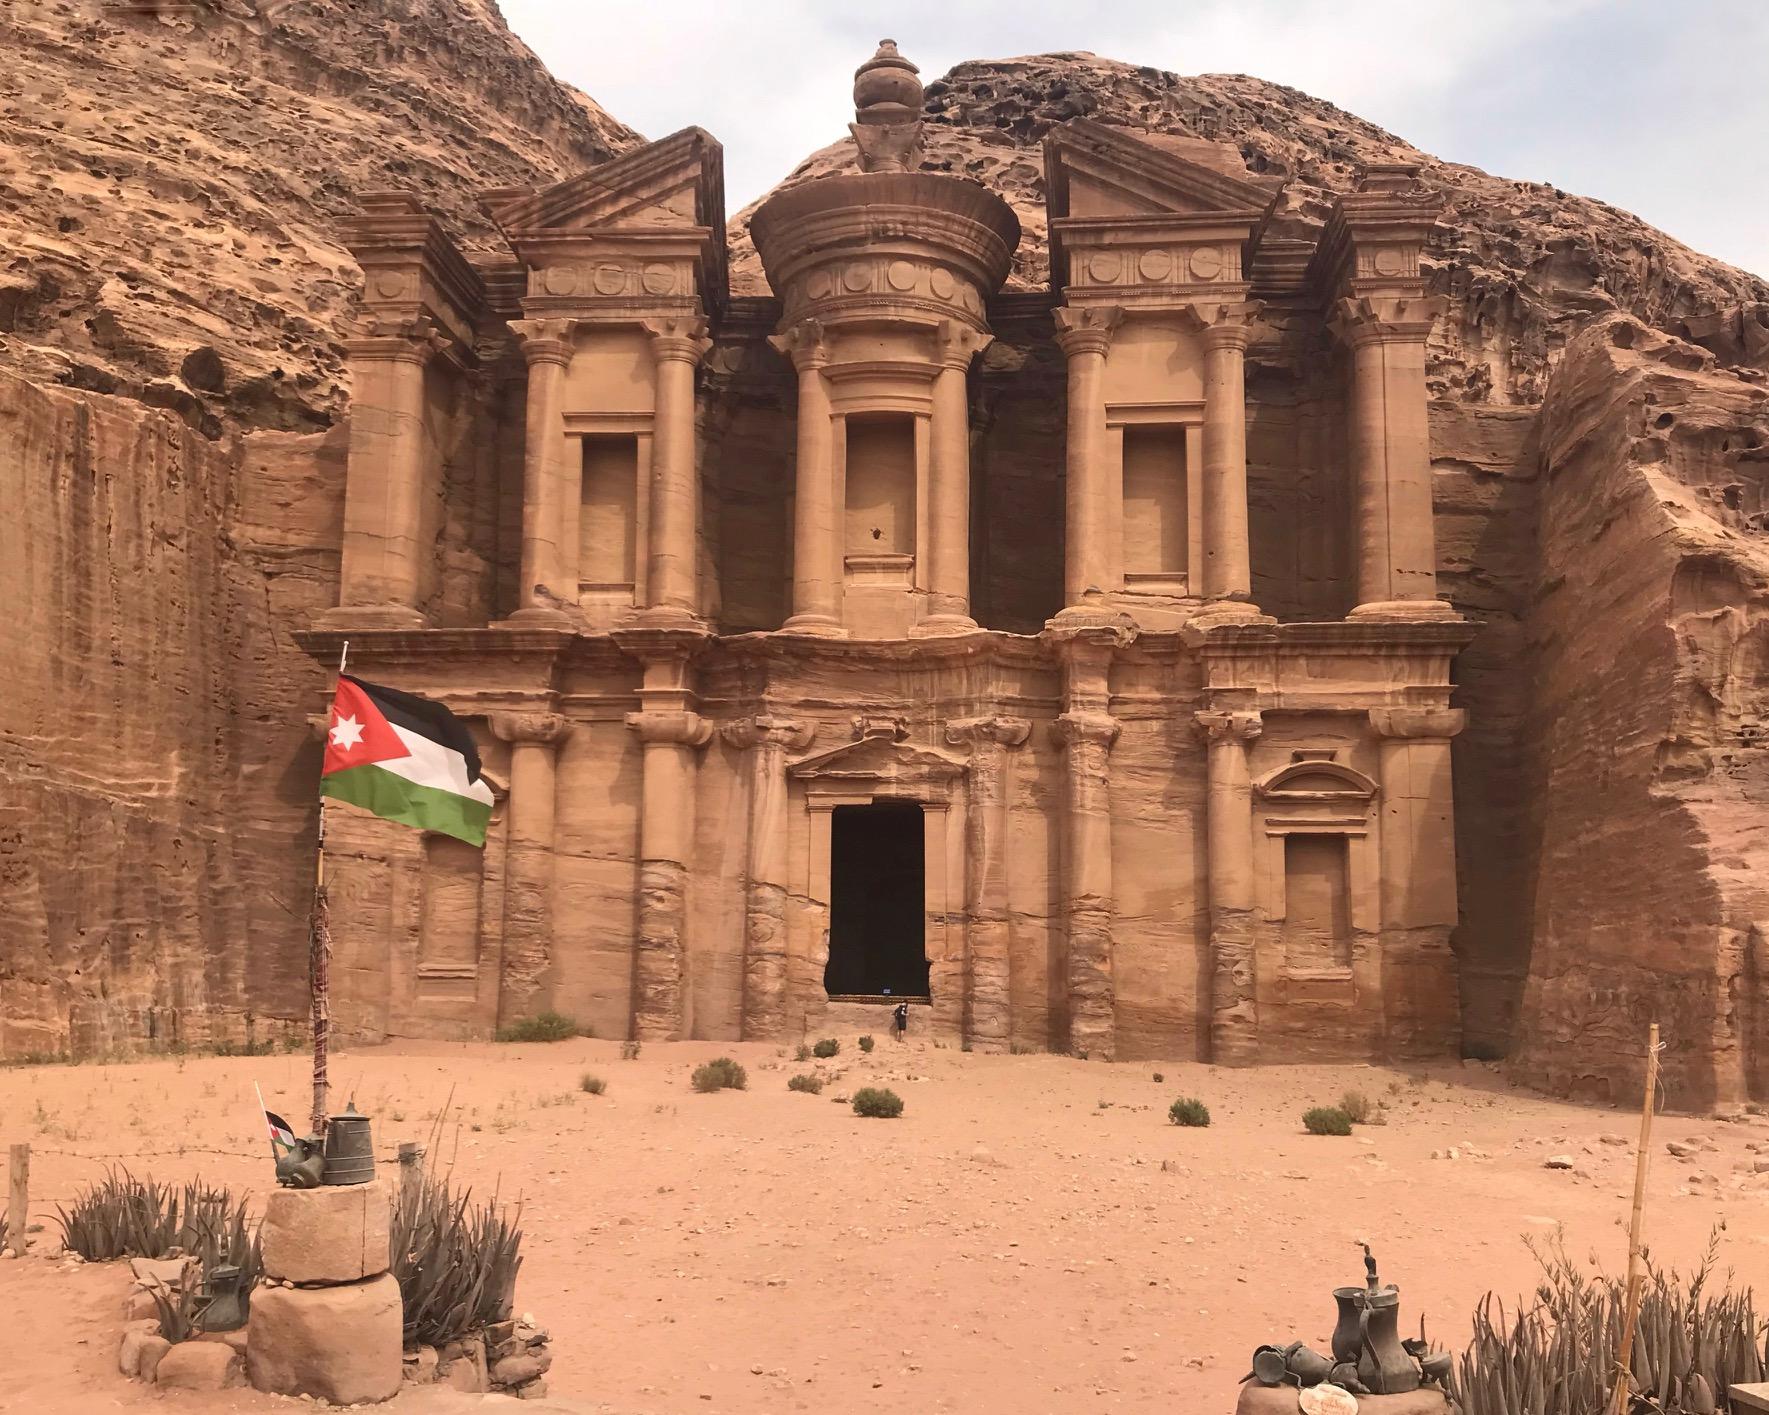 The façade of the Monastery is even more impressive than the Treasury. Photo: Gayatri Bhaumik.